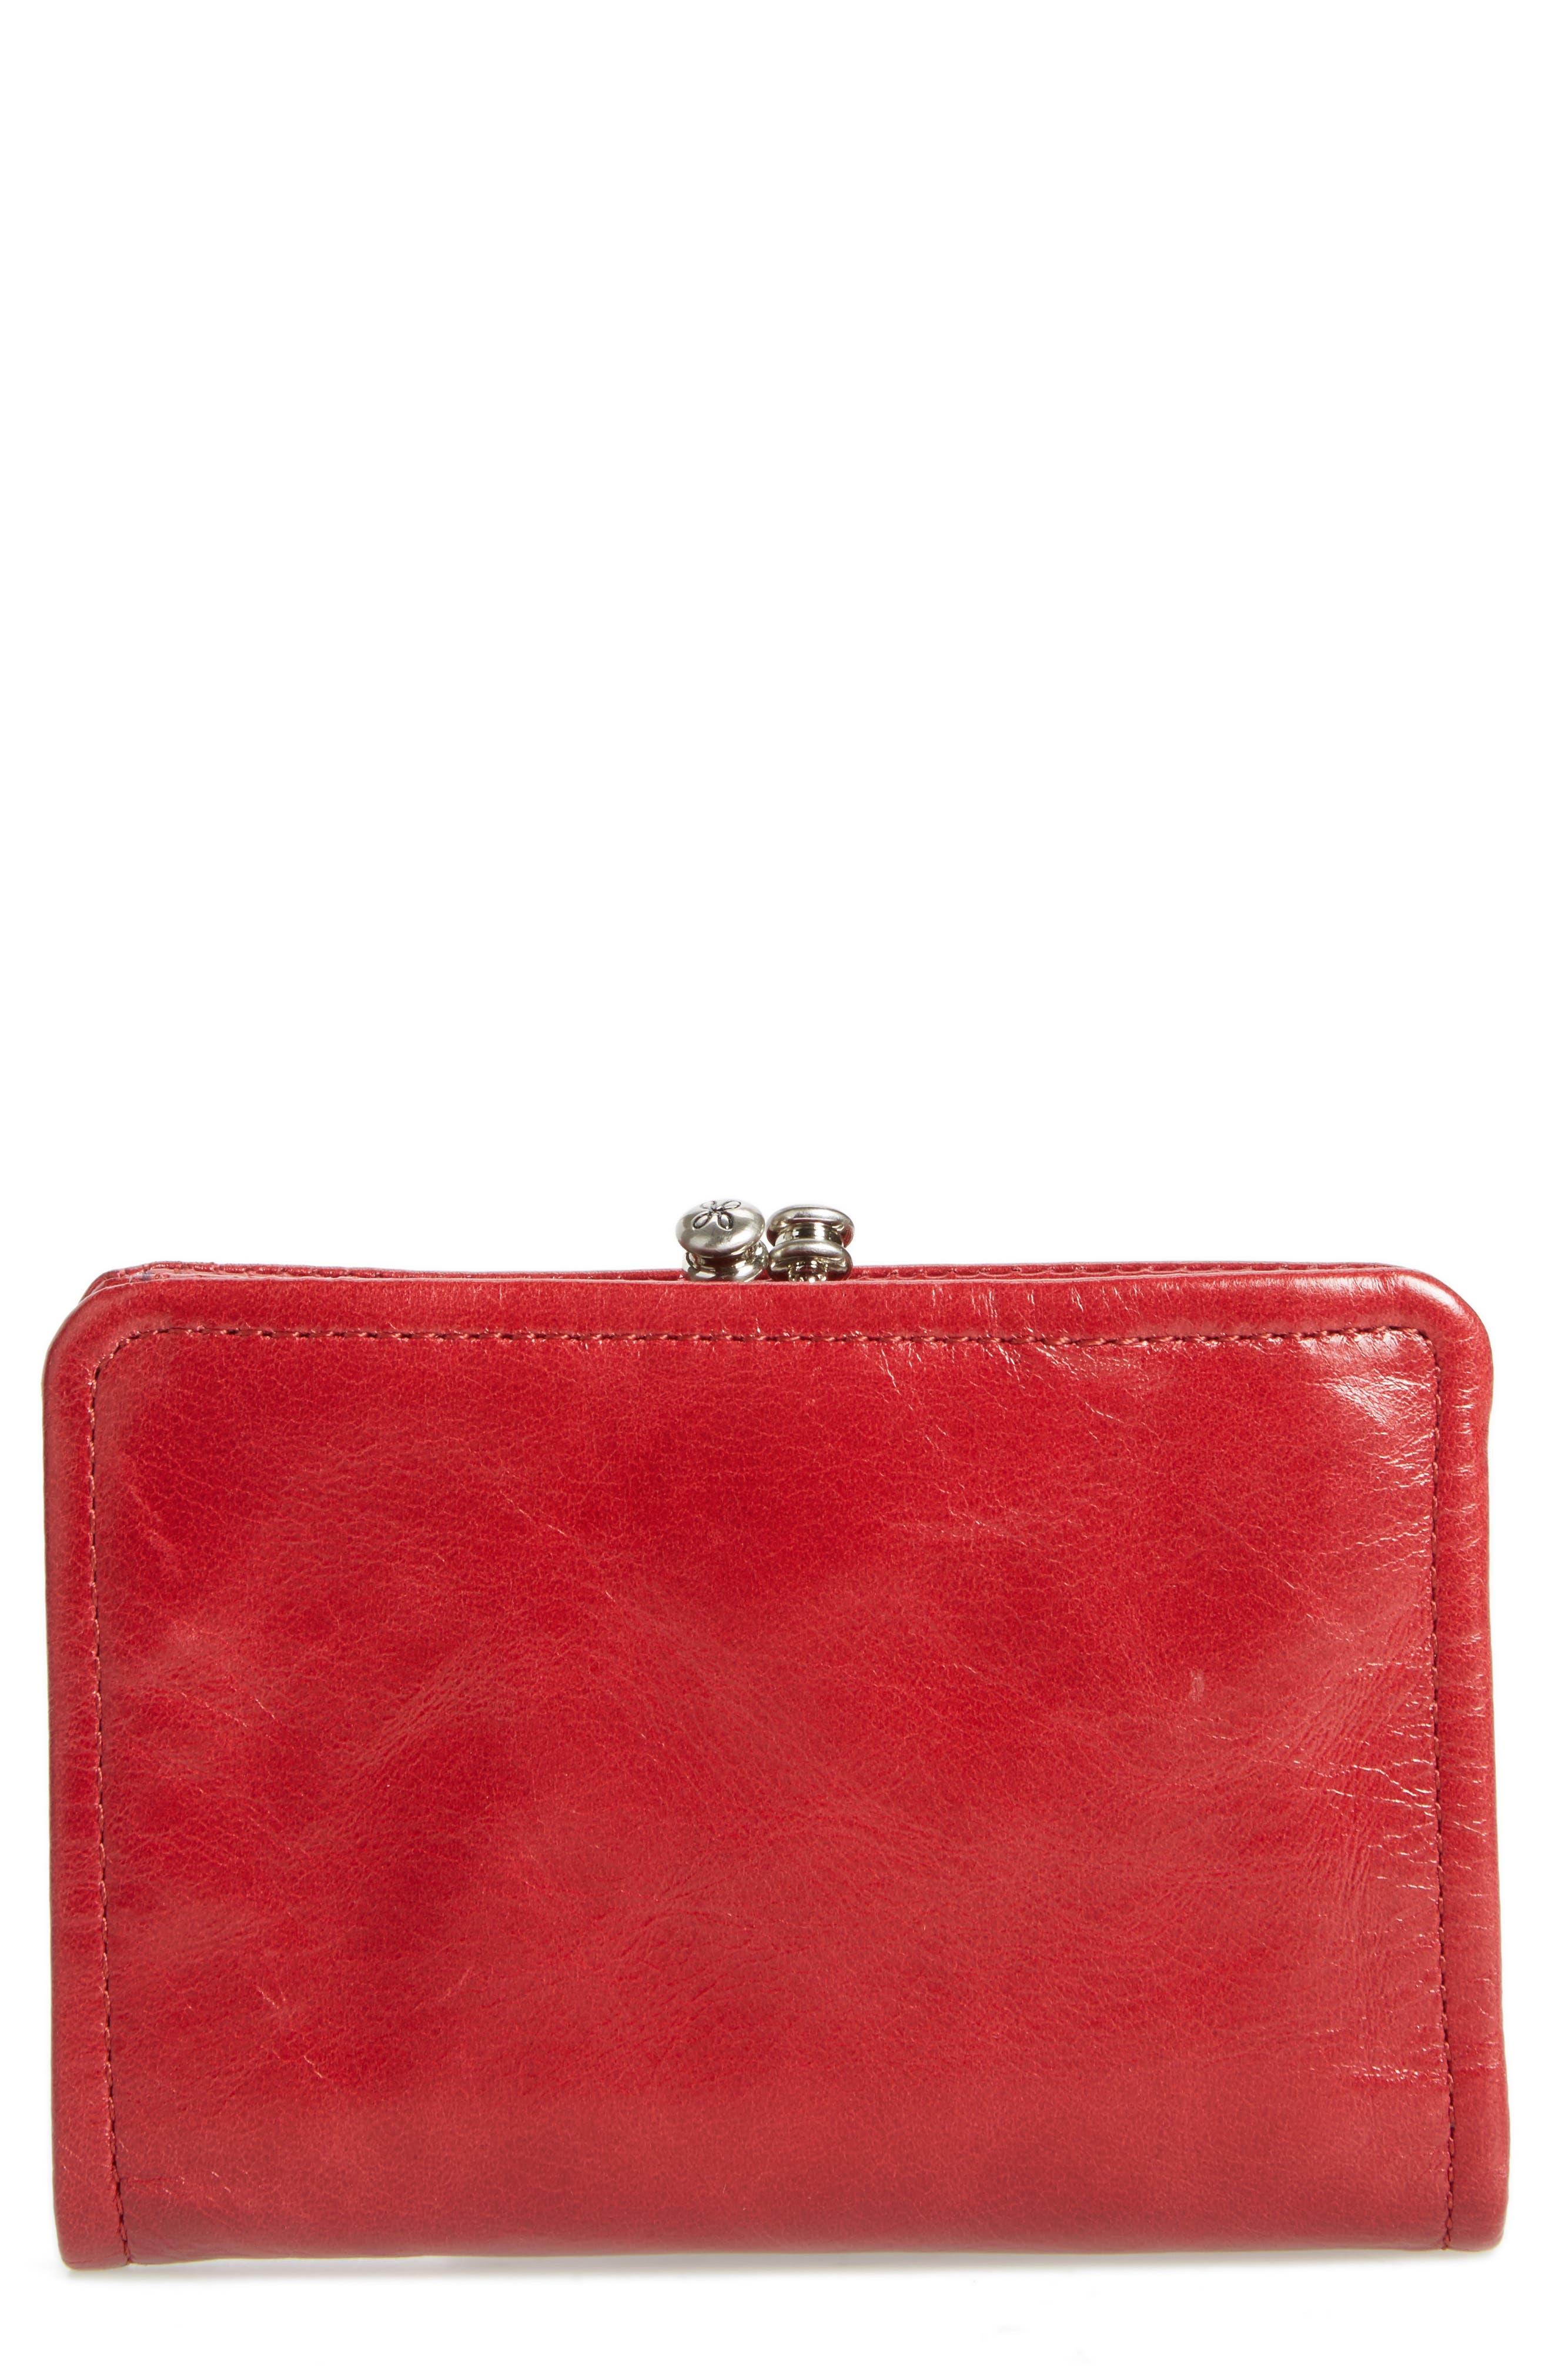 Main Image - Hobo Delta Calfskin Leather Wallet